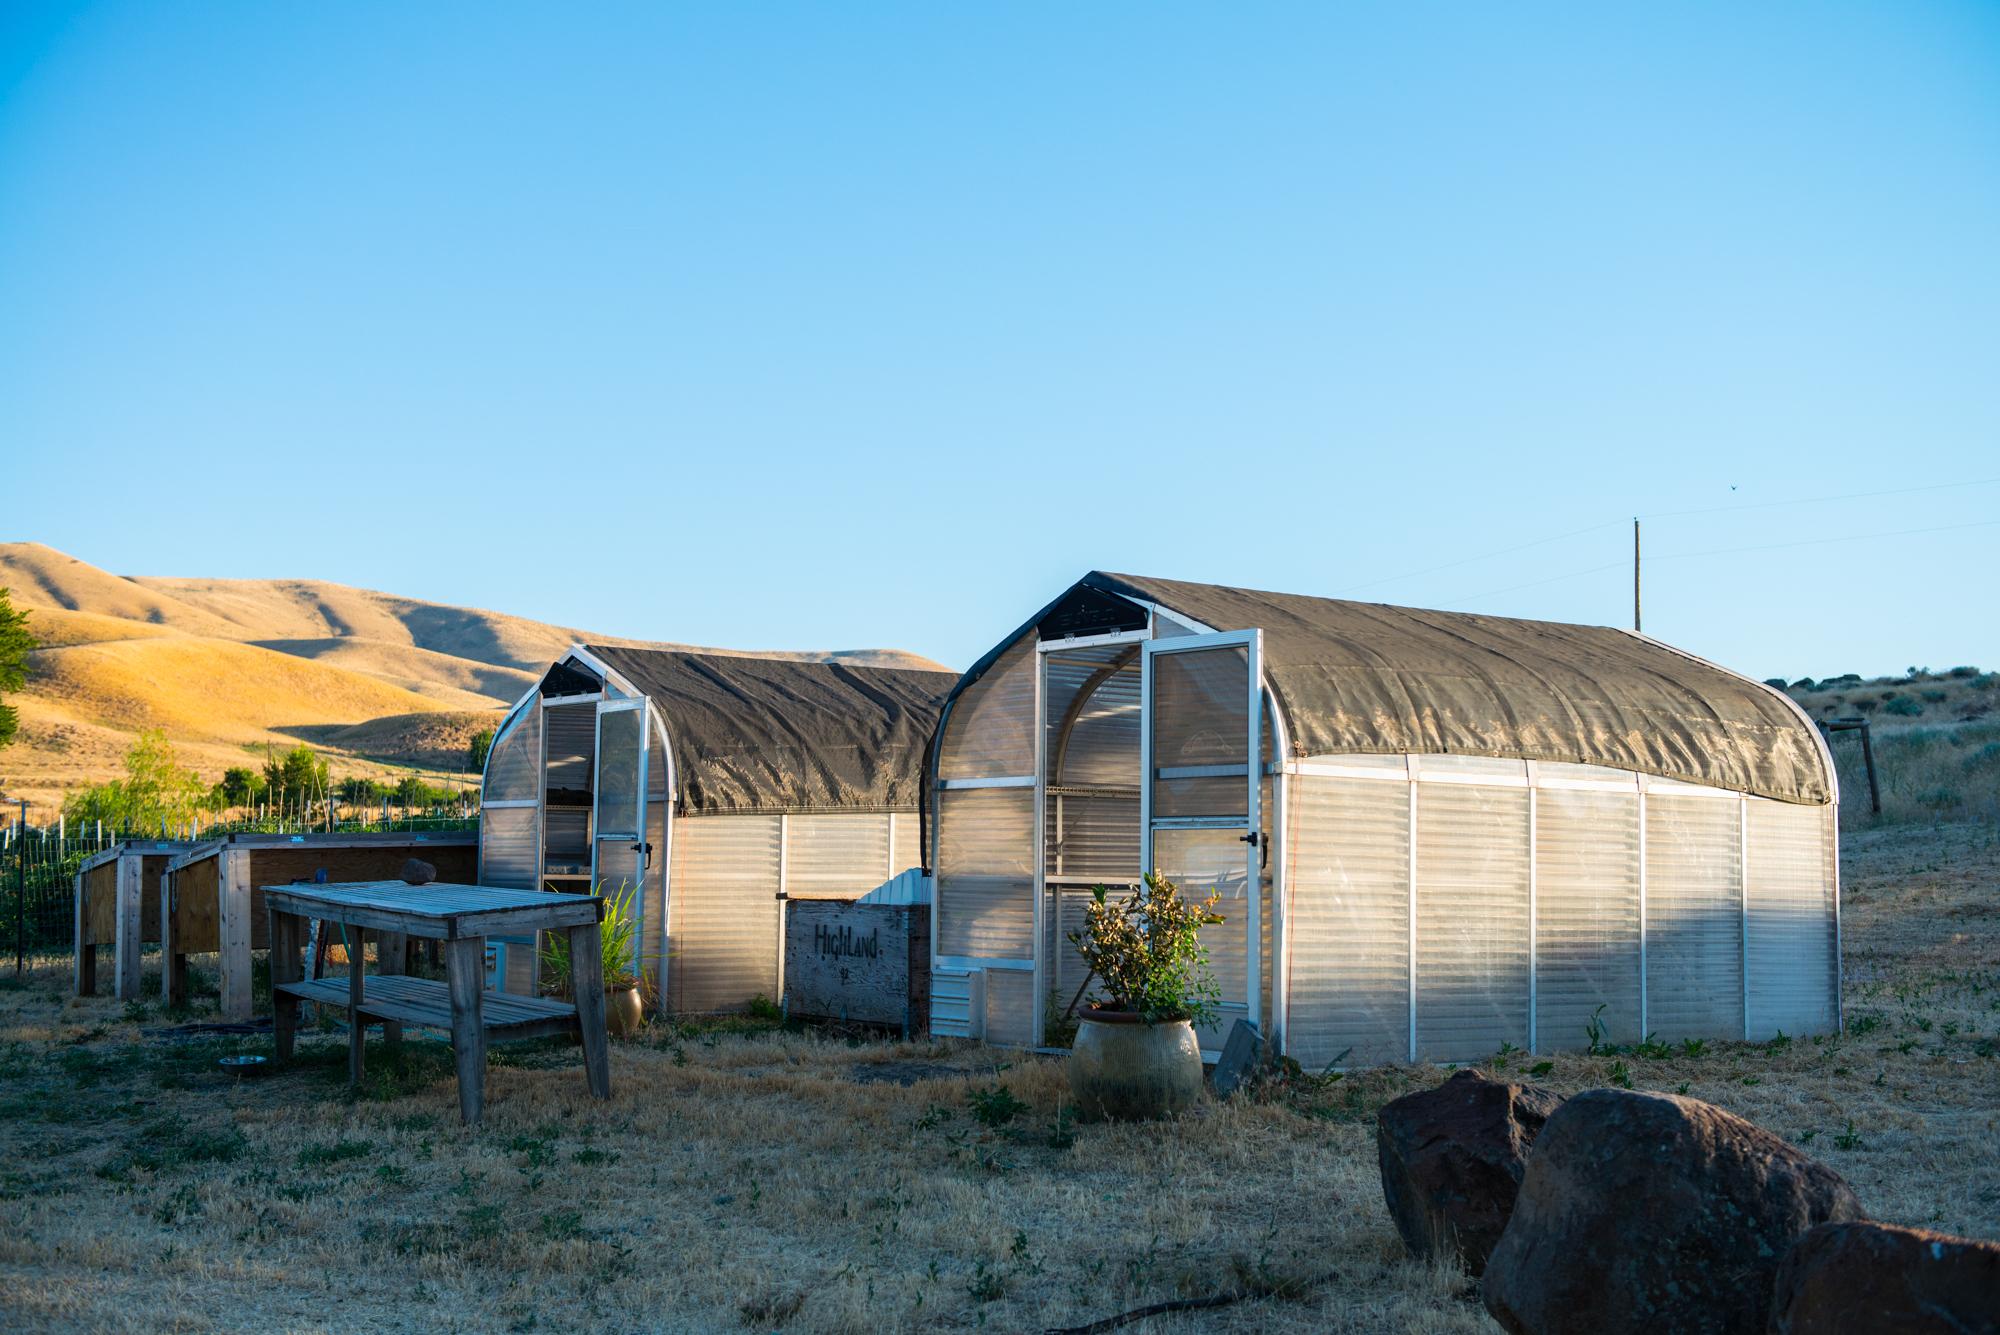 Two greenhouses farm